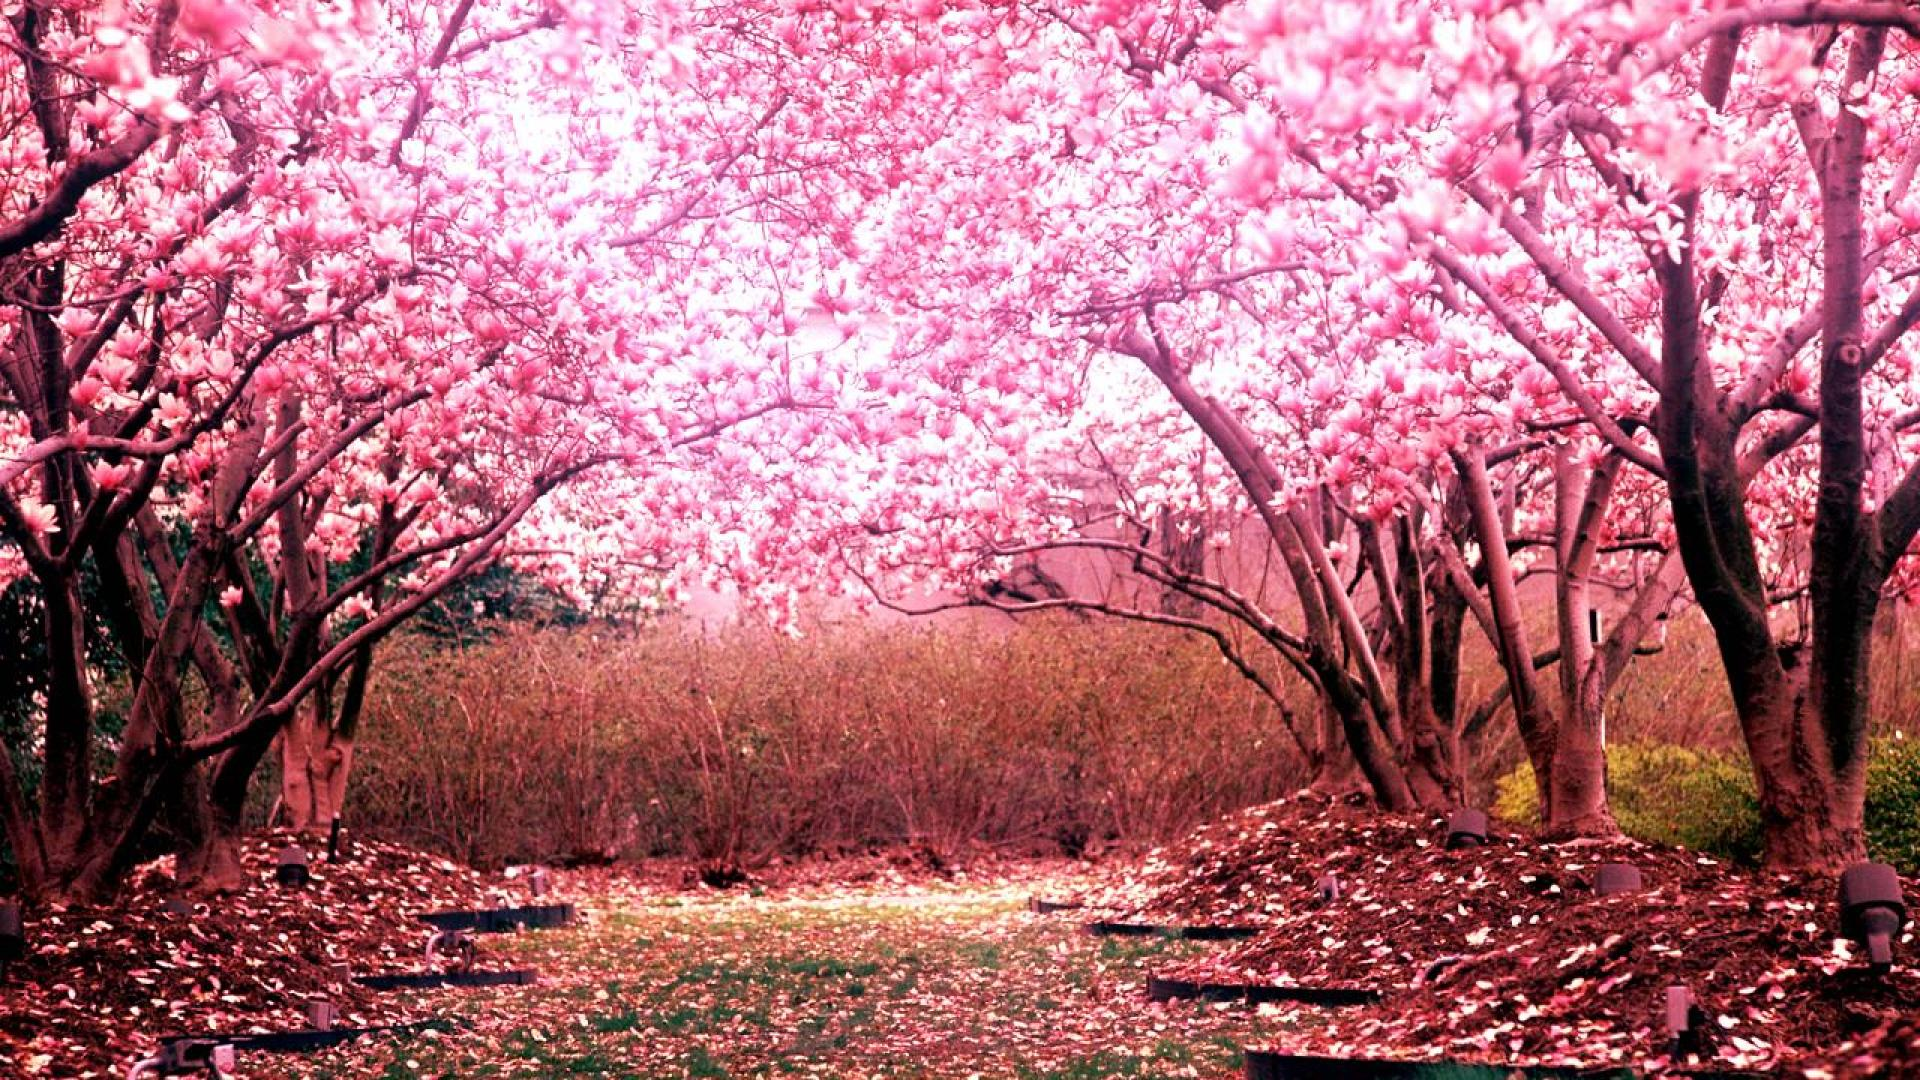 Cherry Blossom Wallpaper HD 1920x1080